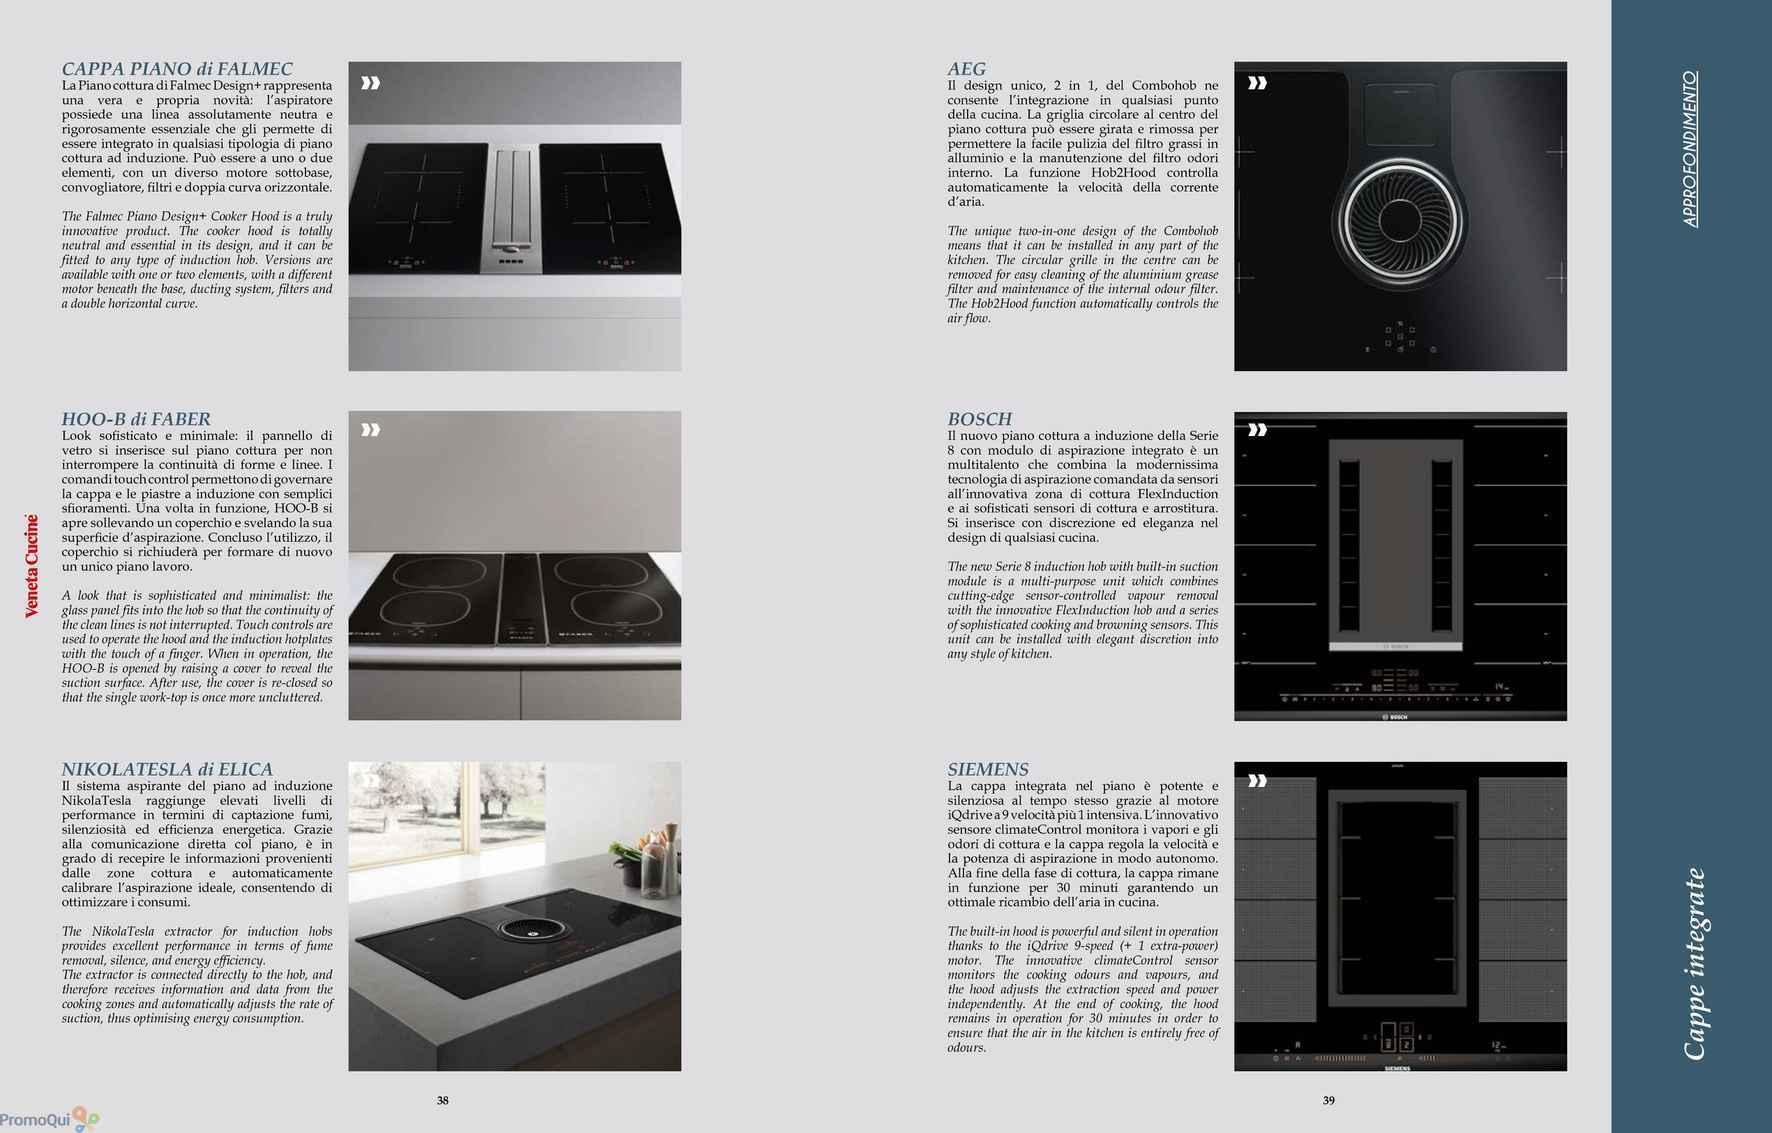 Stunning cappe veneta cucine images for Piano cottura con cappa integrata